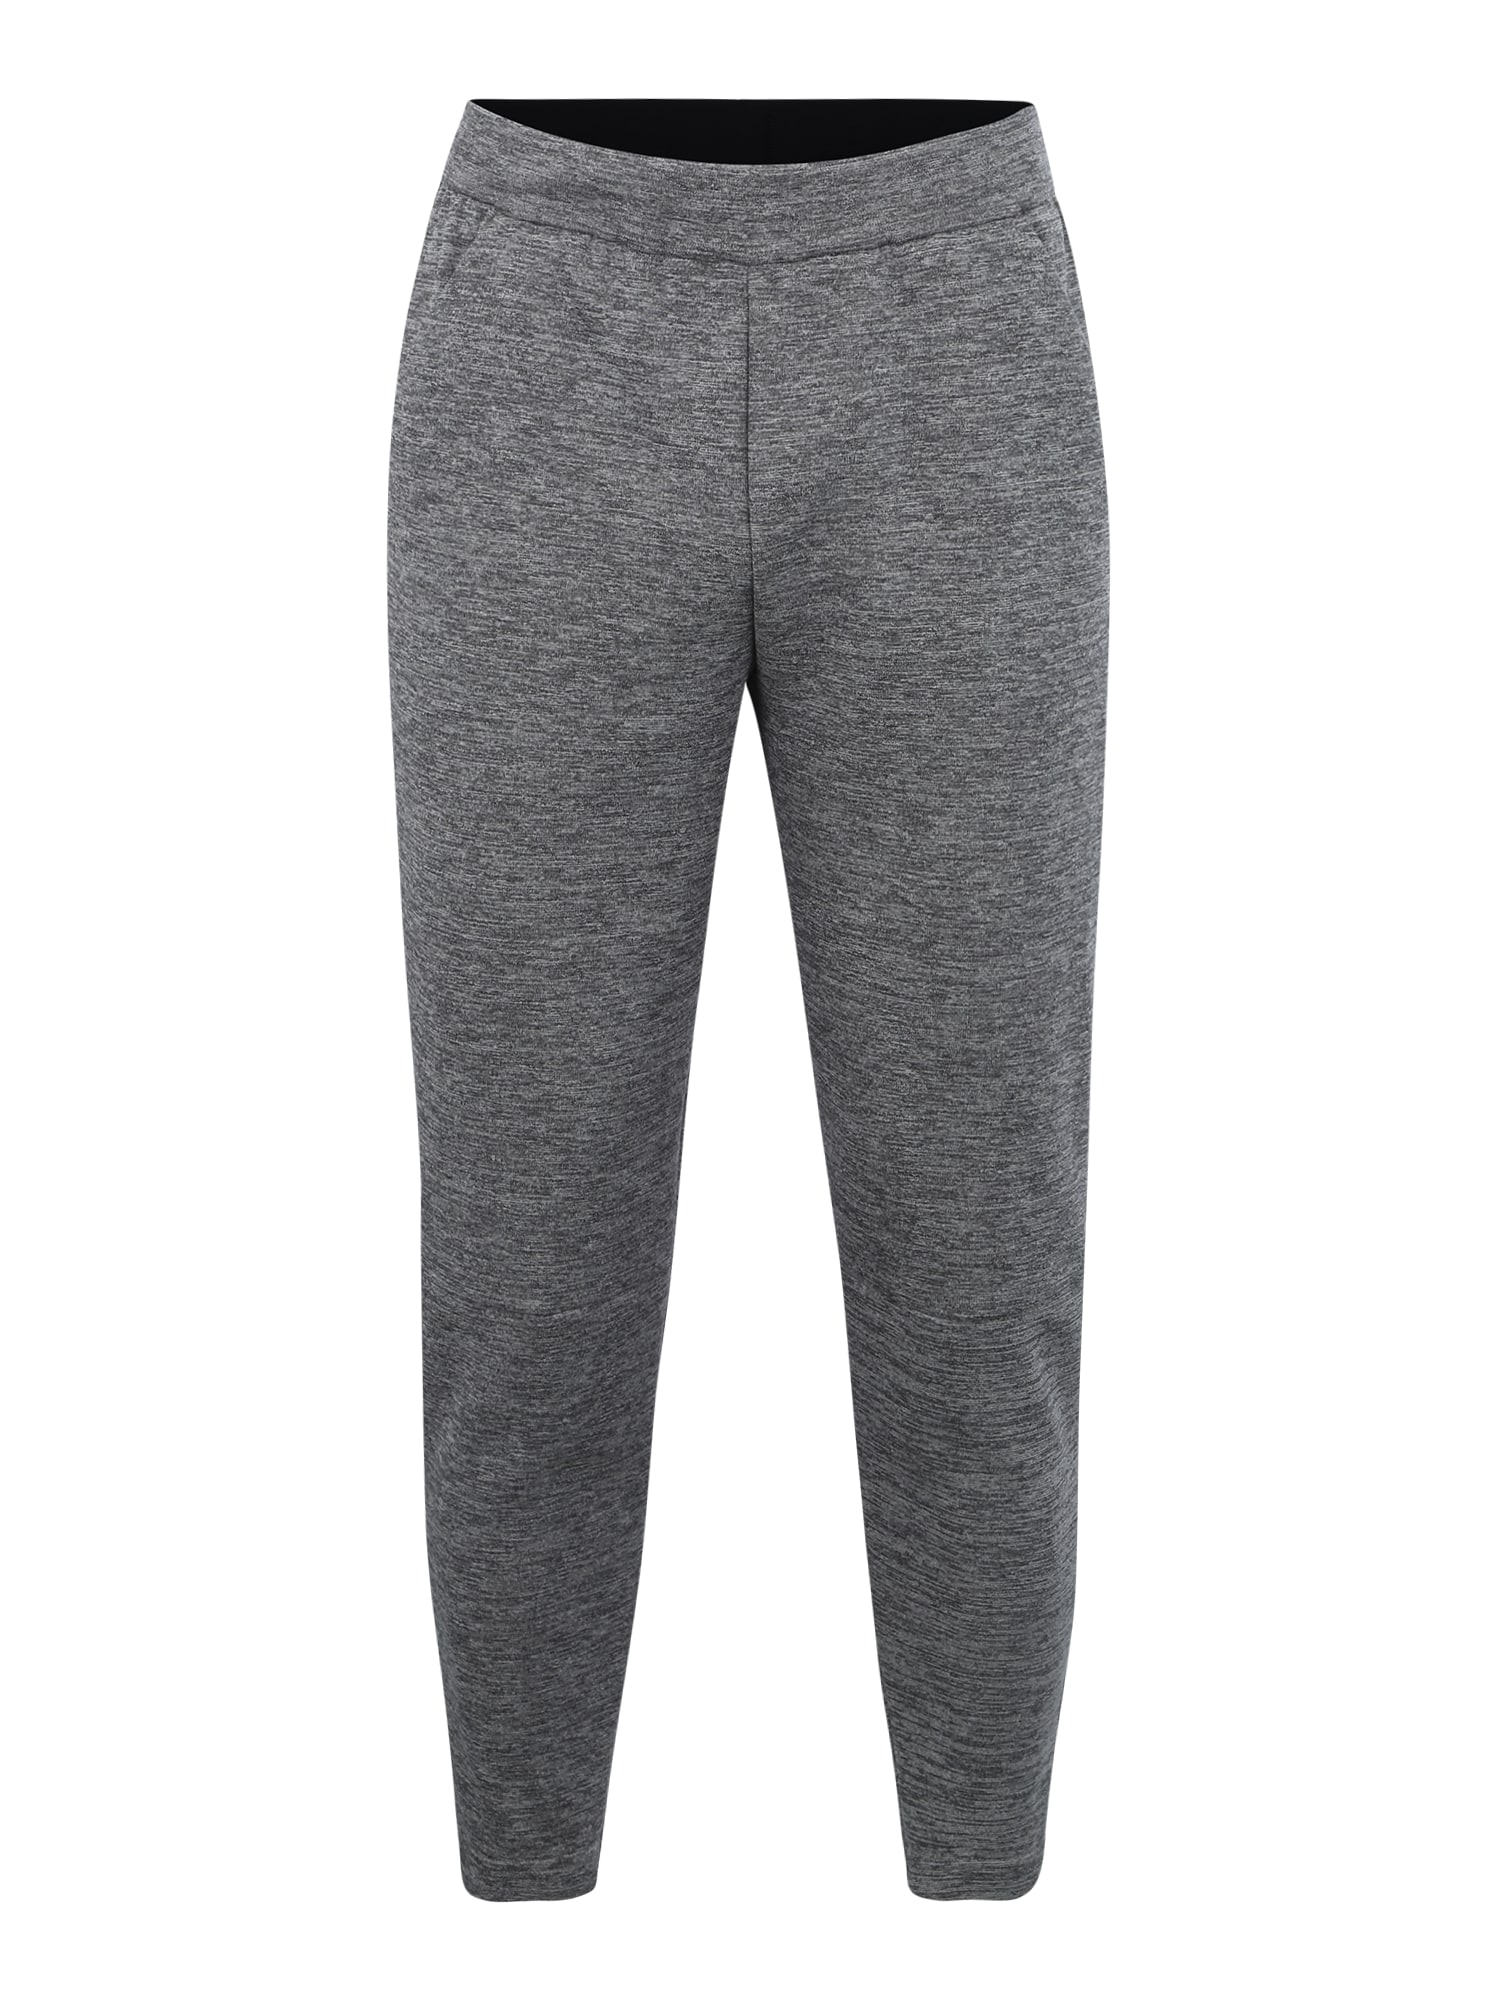 Sweatpants | Bekleidung > Hosen > Sweathosen | adidas performance